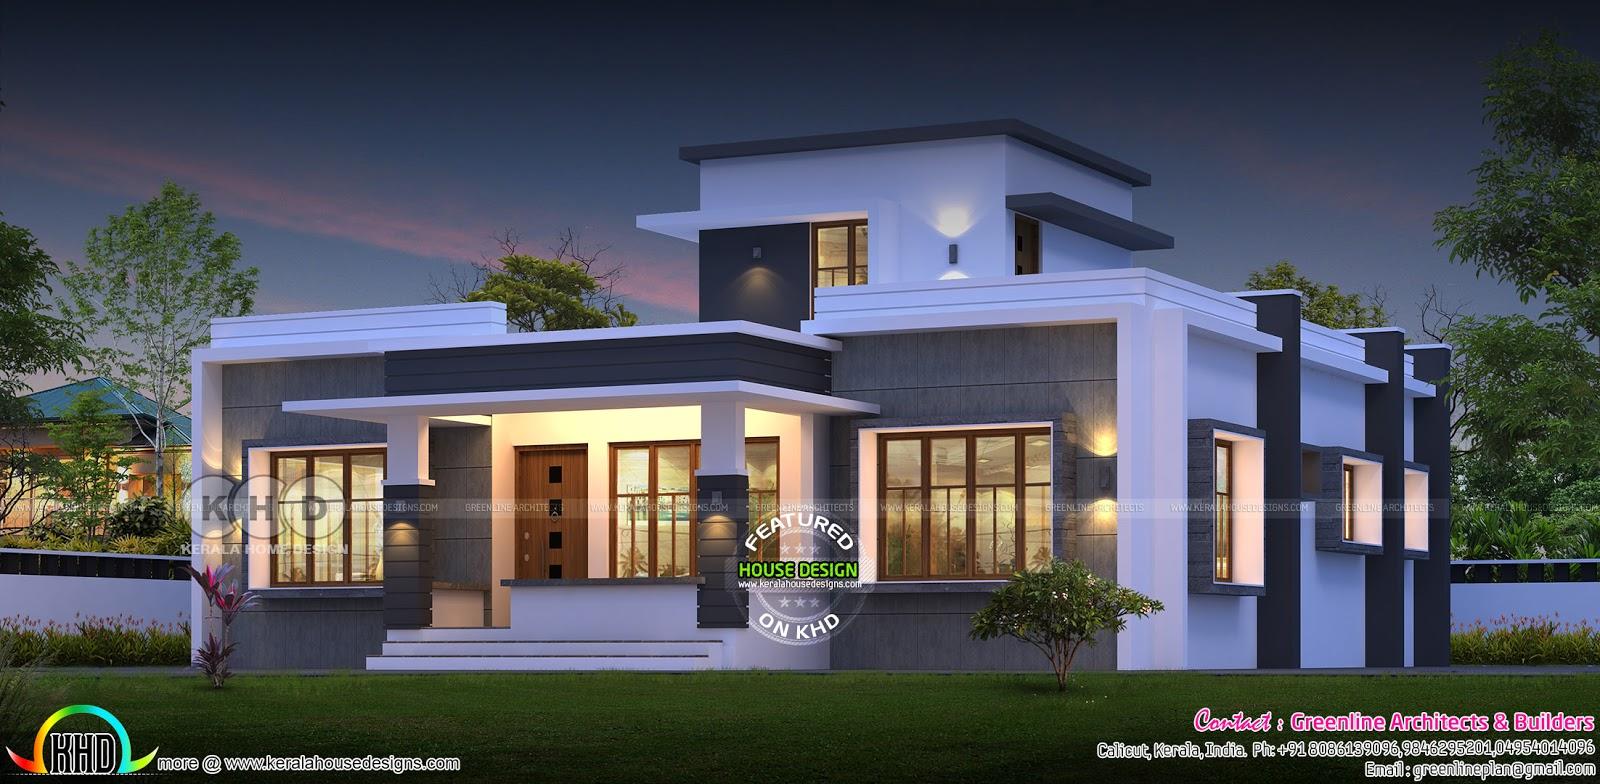 1737 Square Feet 3 Bedroom Flat Roof Modern Single Storied House Kerala Home Design Bloglovin